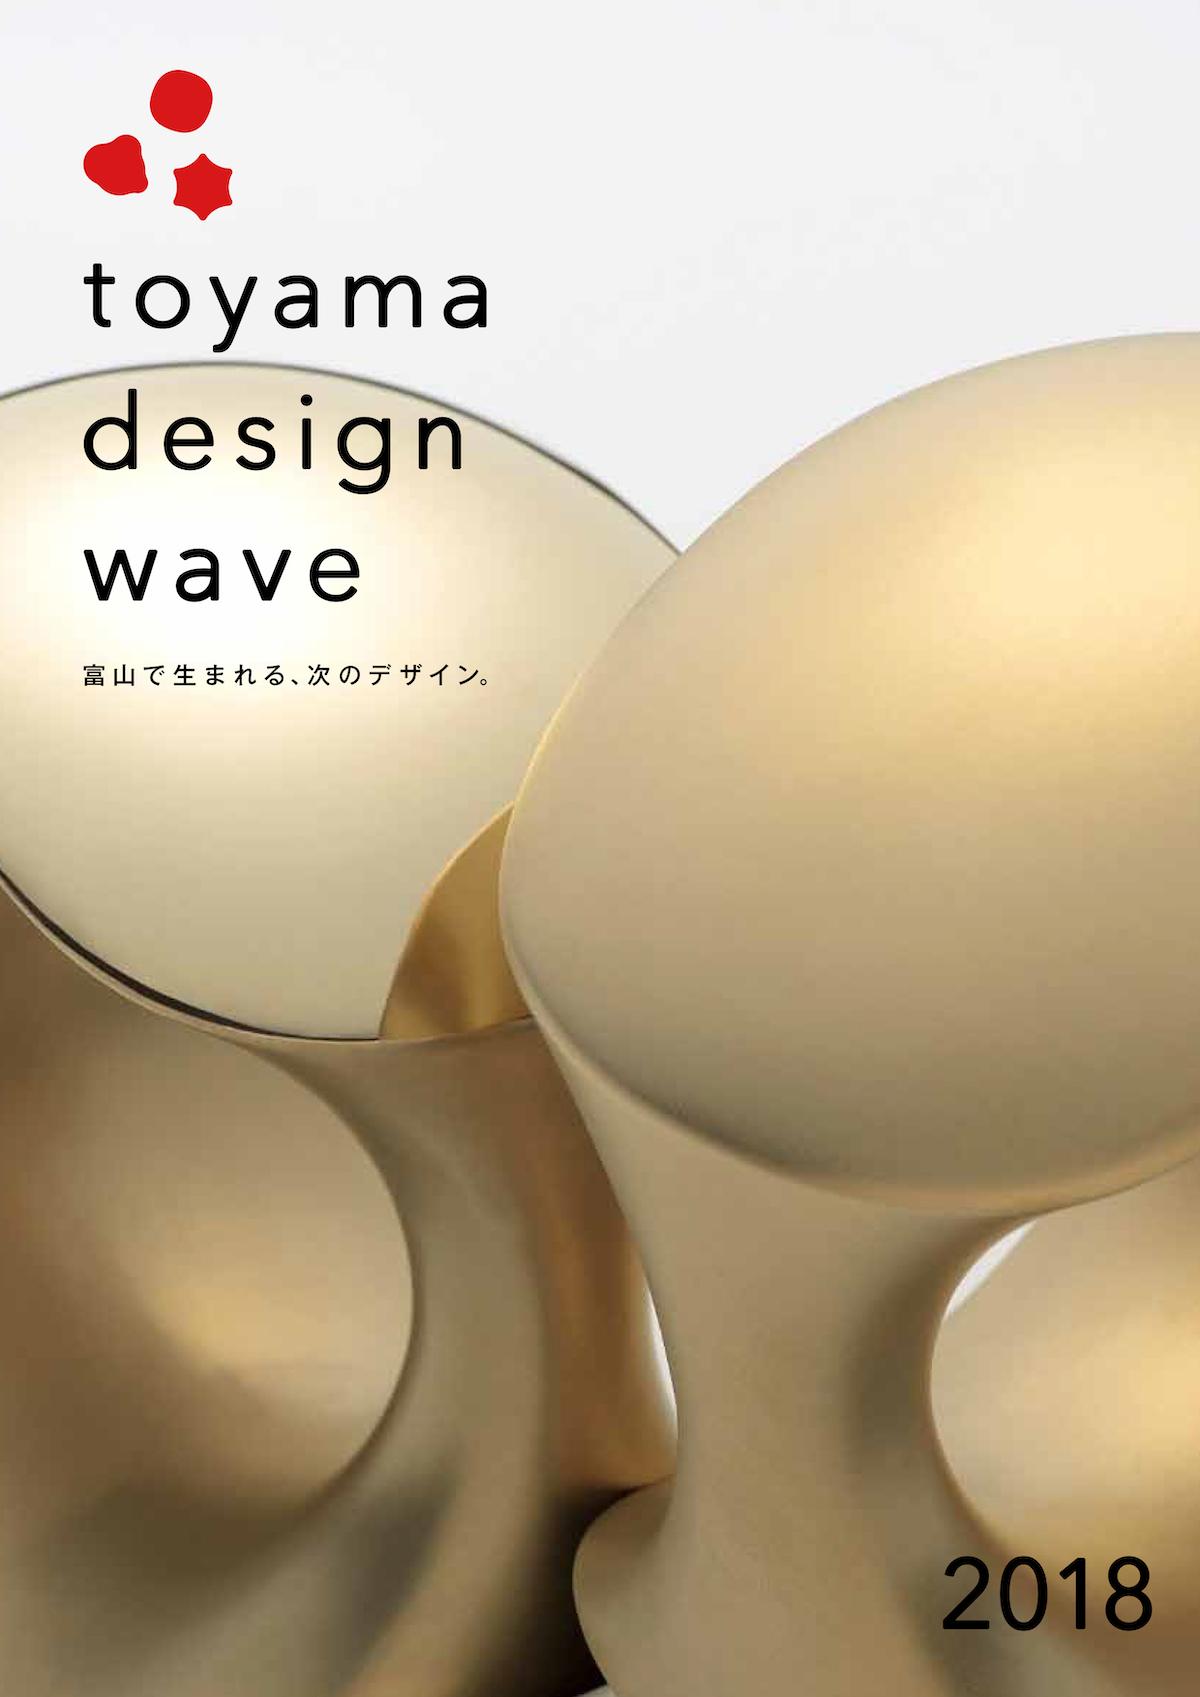 TOYAMA DESIGN WAVE REPORT